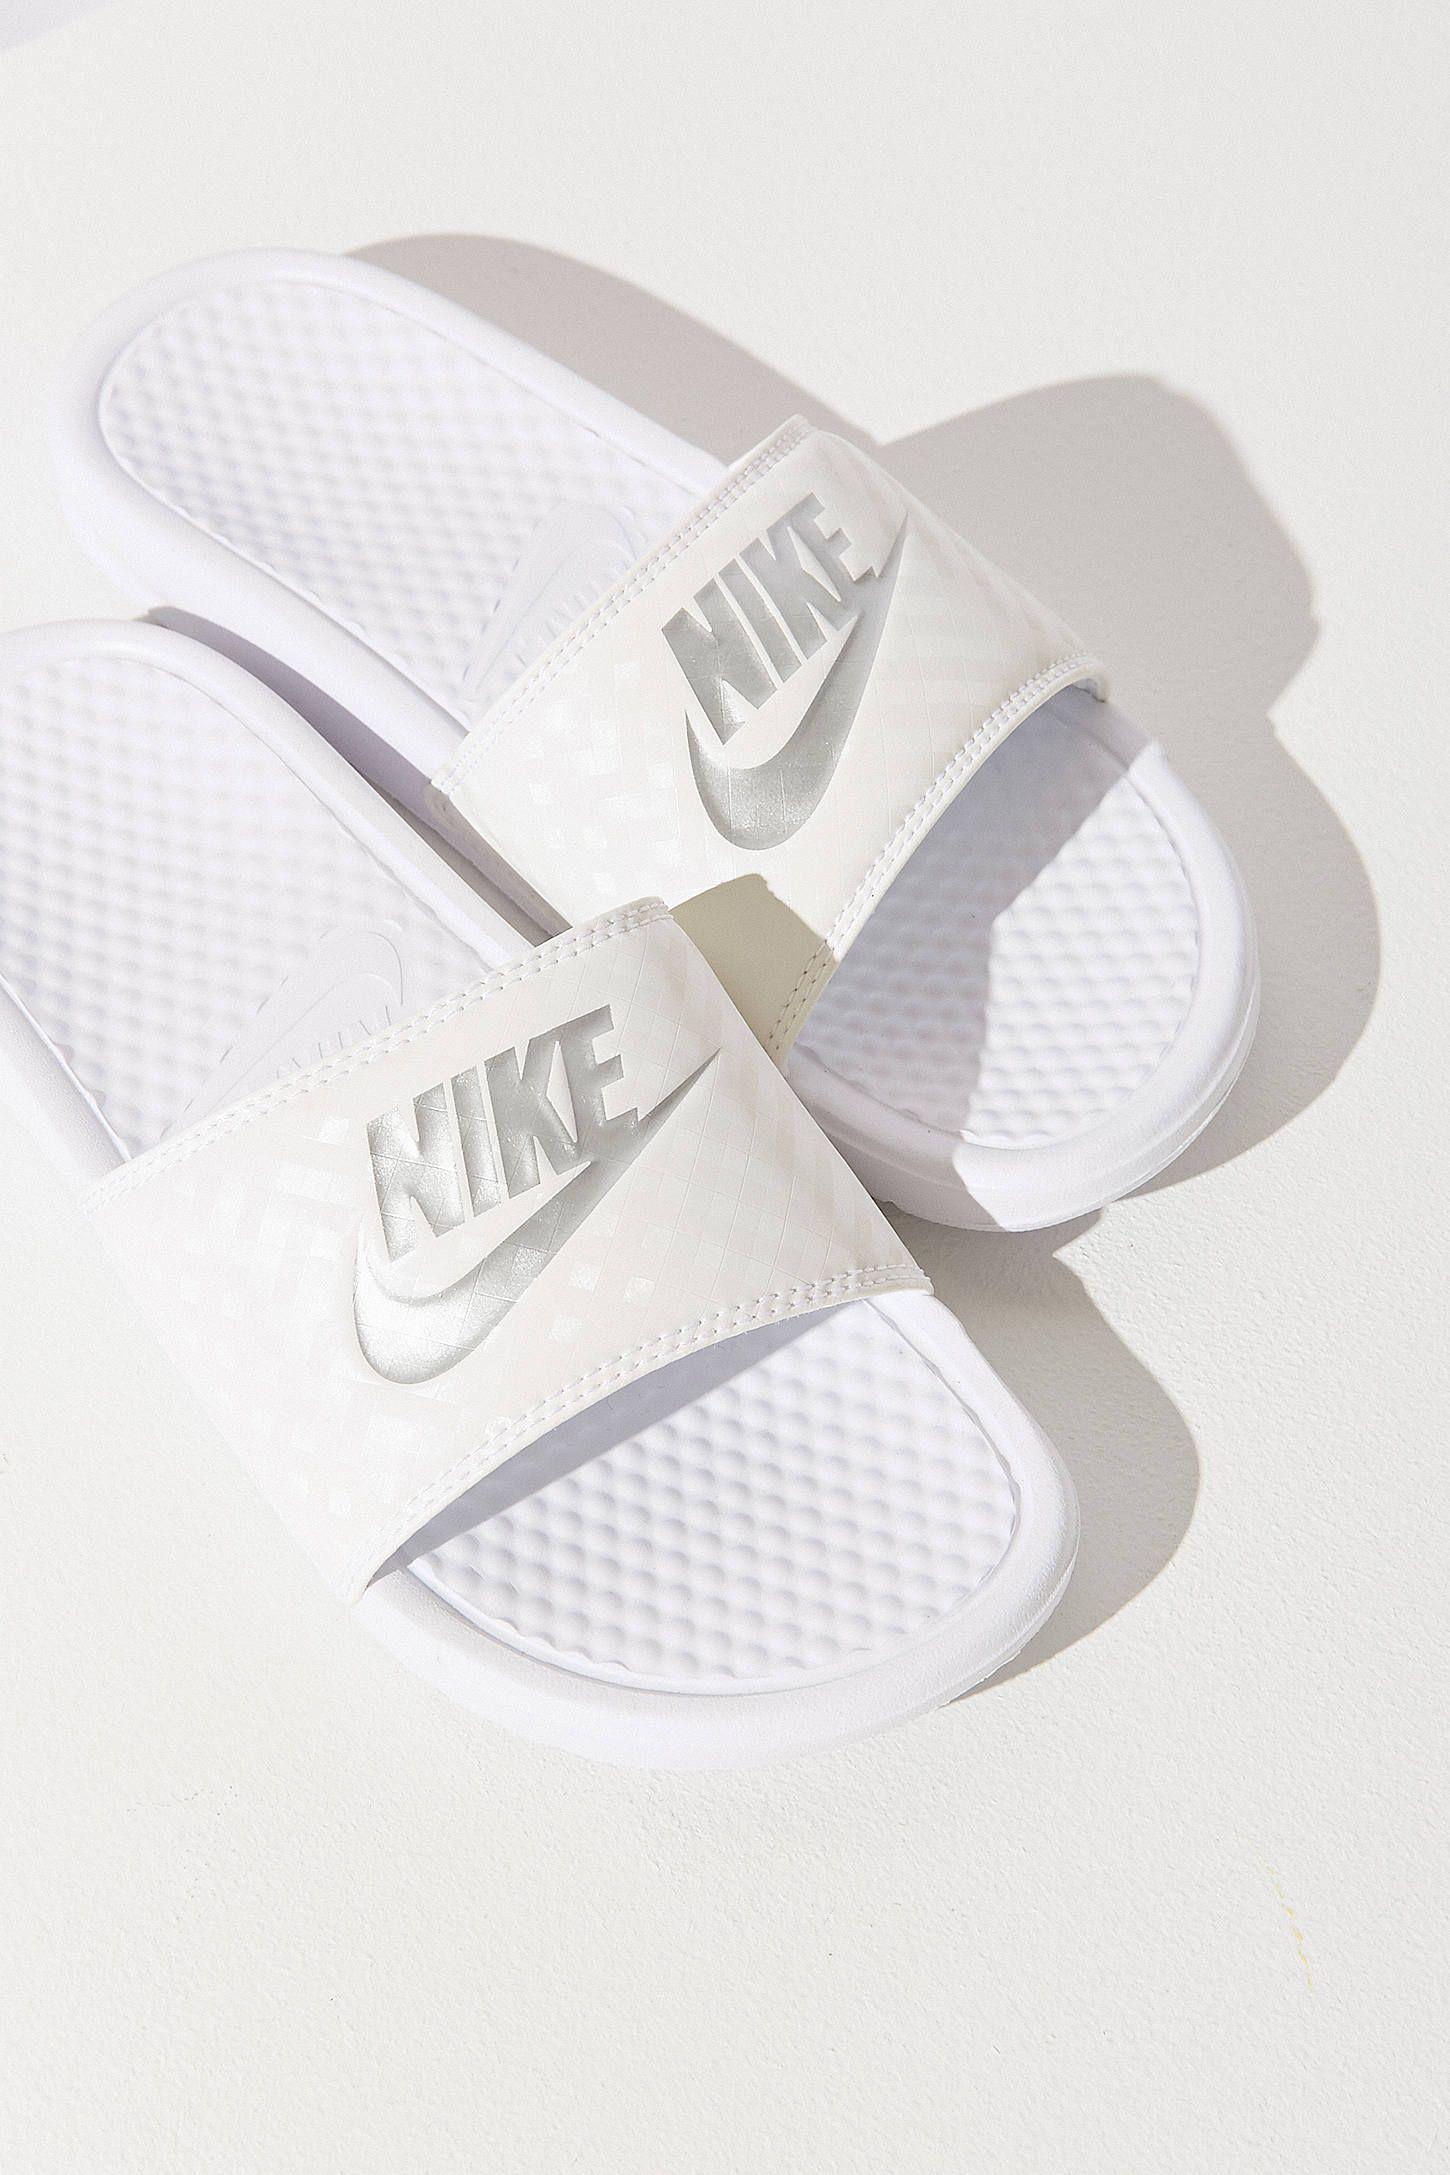 a12eaf21027e91 nike benassi JDI slide. urban outfitters. white.